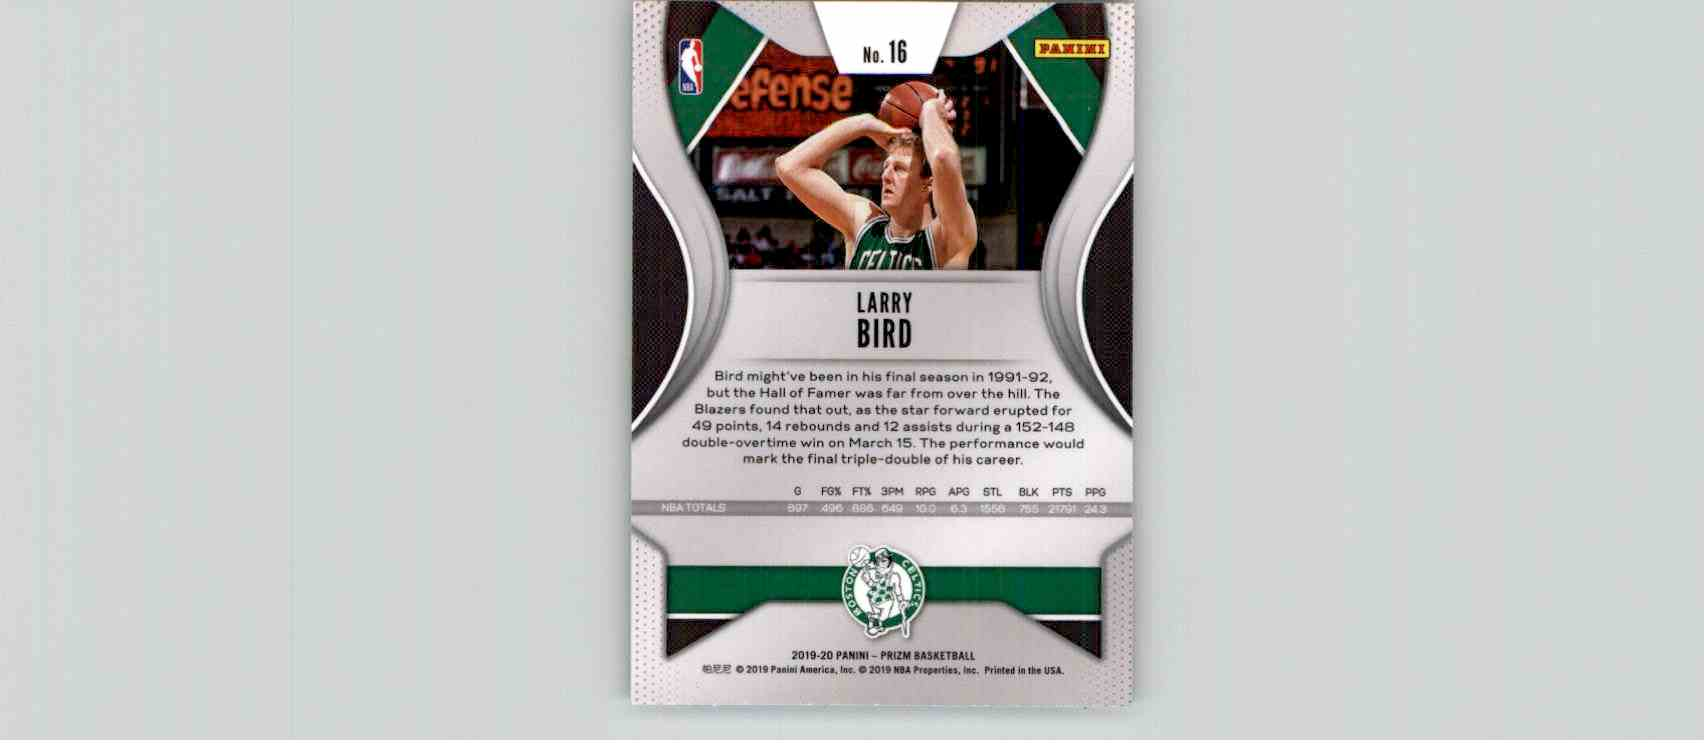 2019-20 Panini Prizm Basketball Prizm Larry Bird #16 card back image